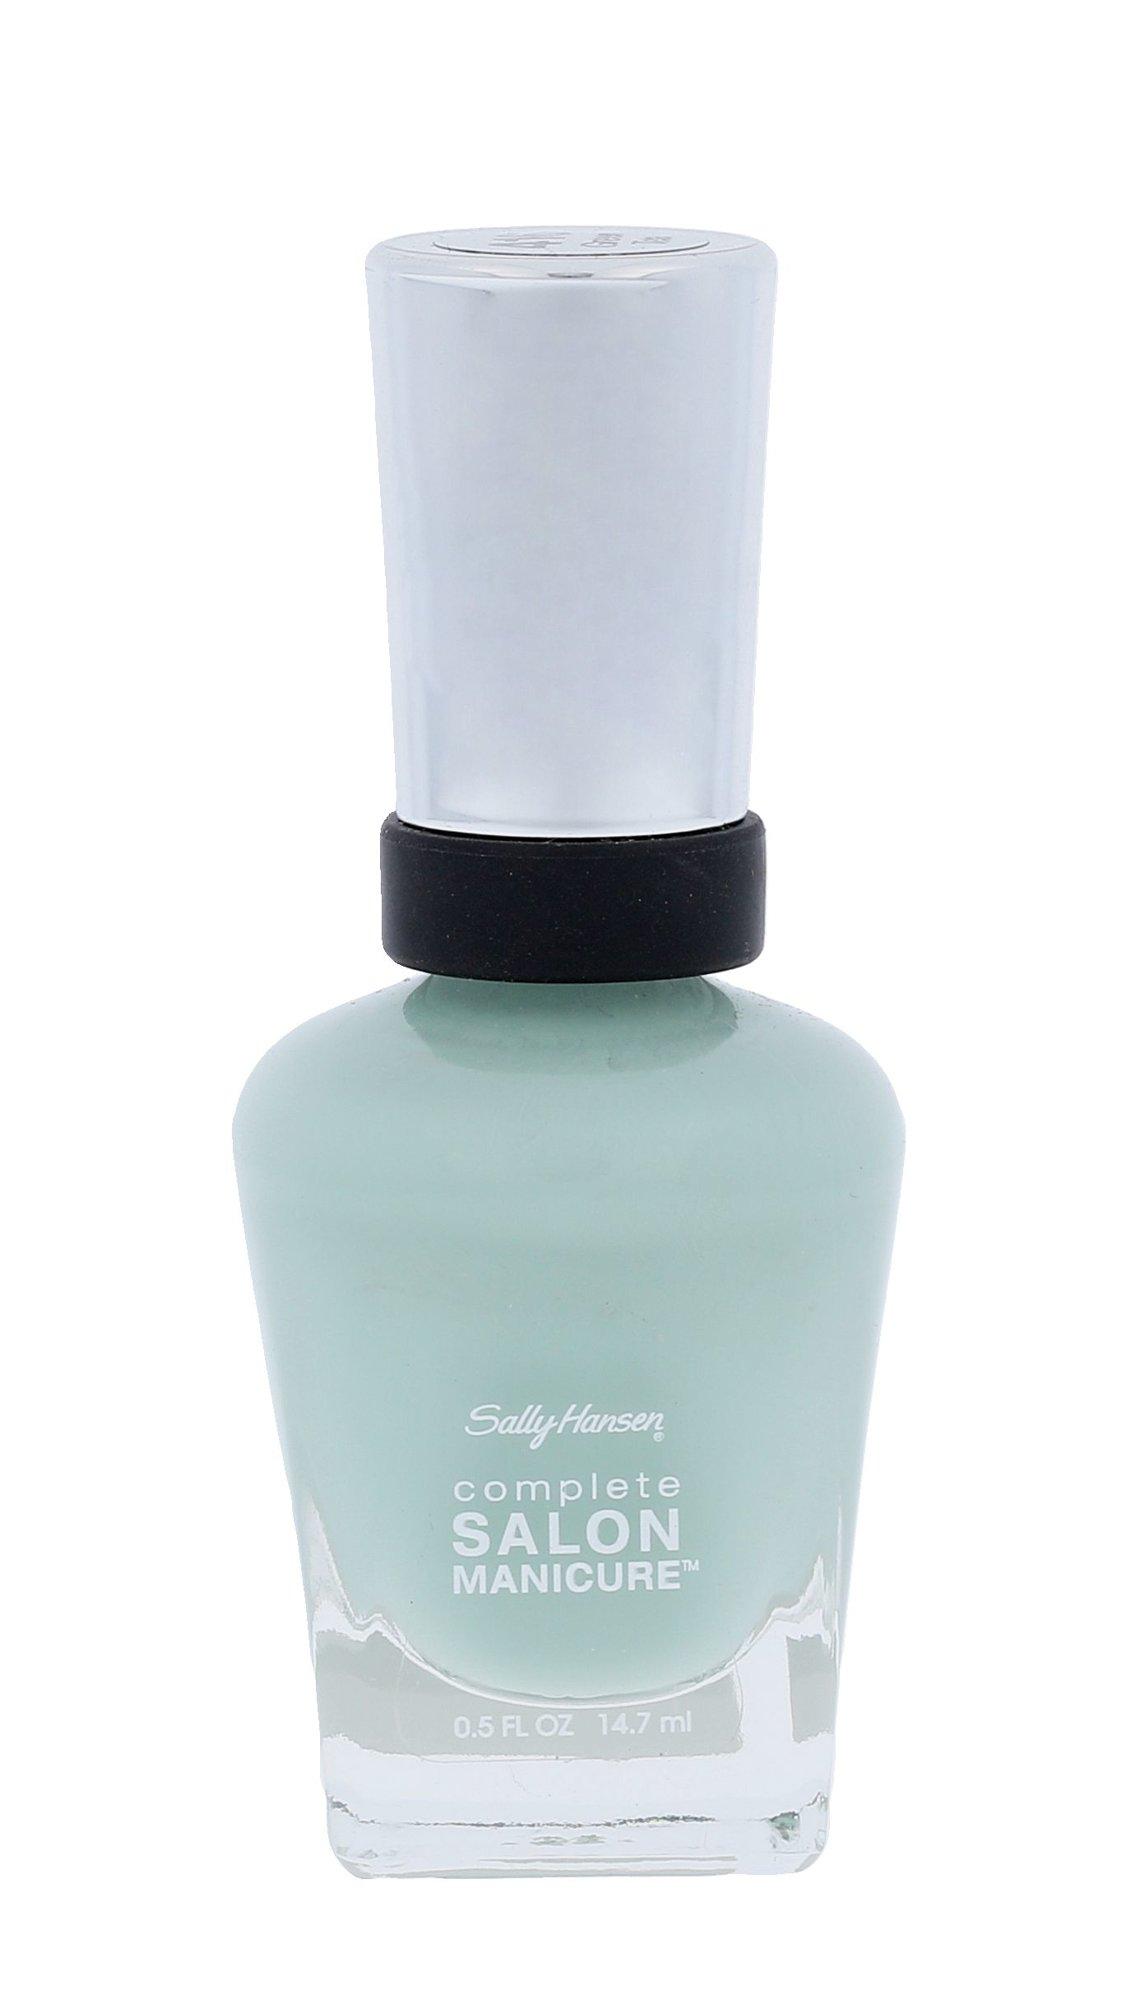 Sally Hansen Complete Salon Manicure Cosmetic 14,7ml 416 Green Tea